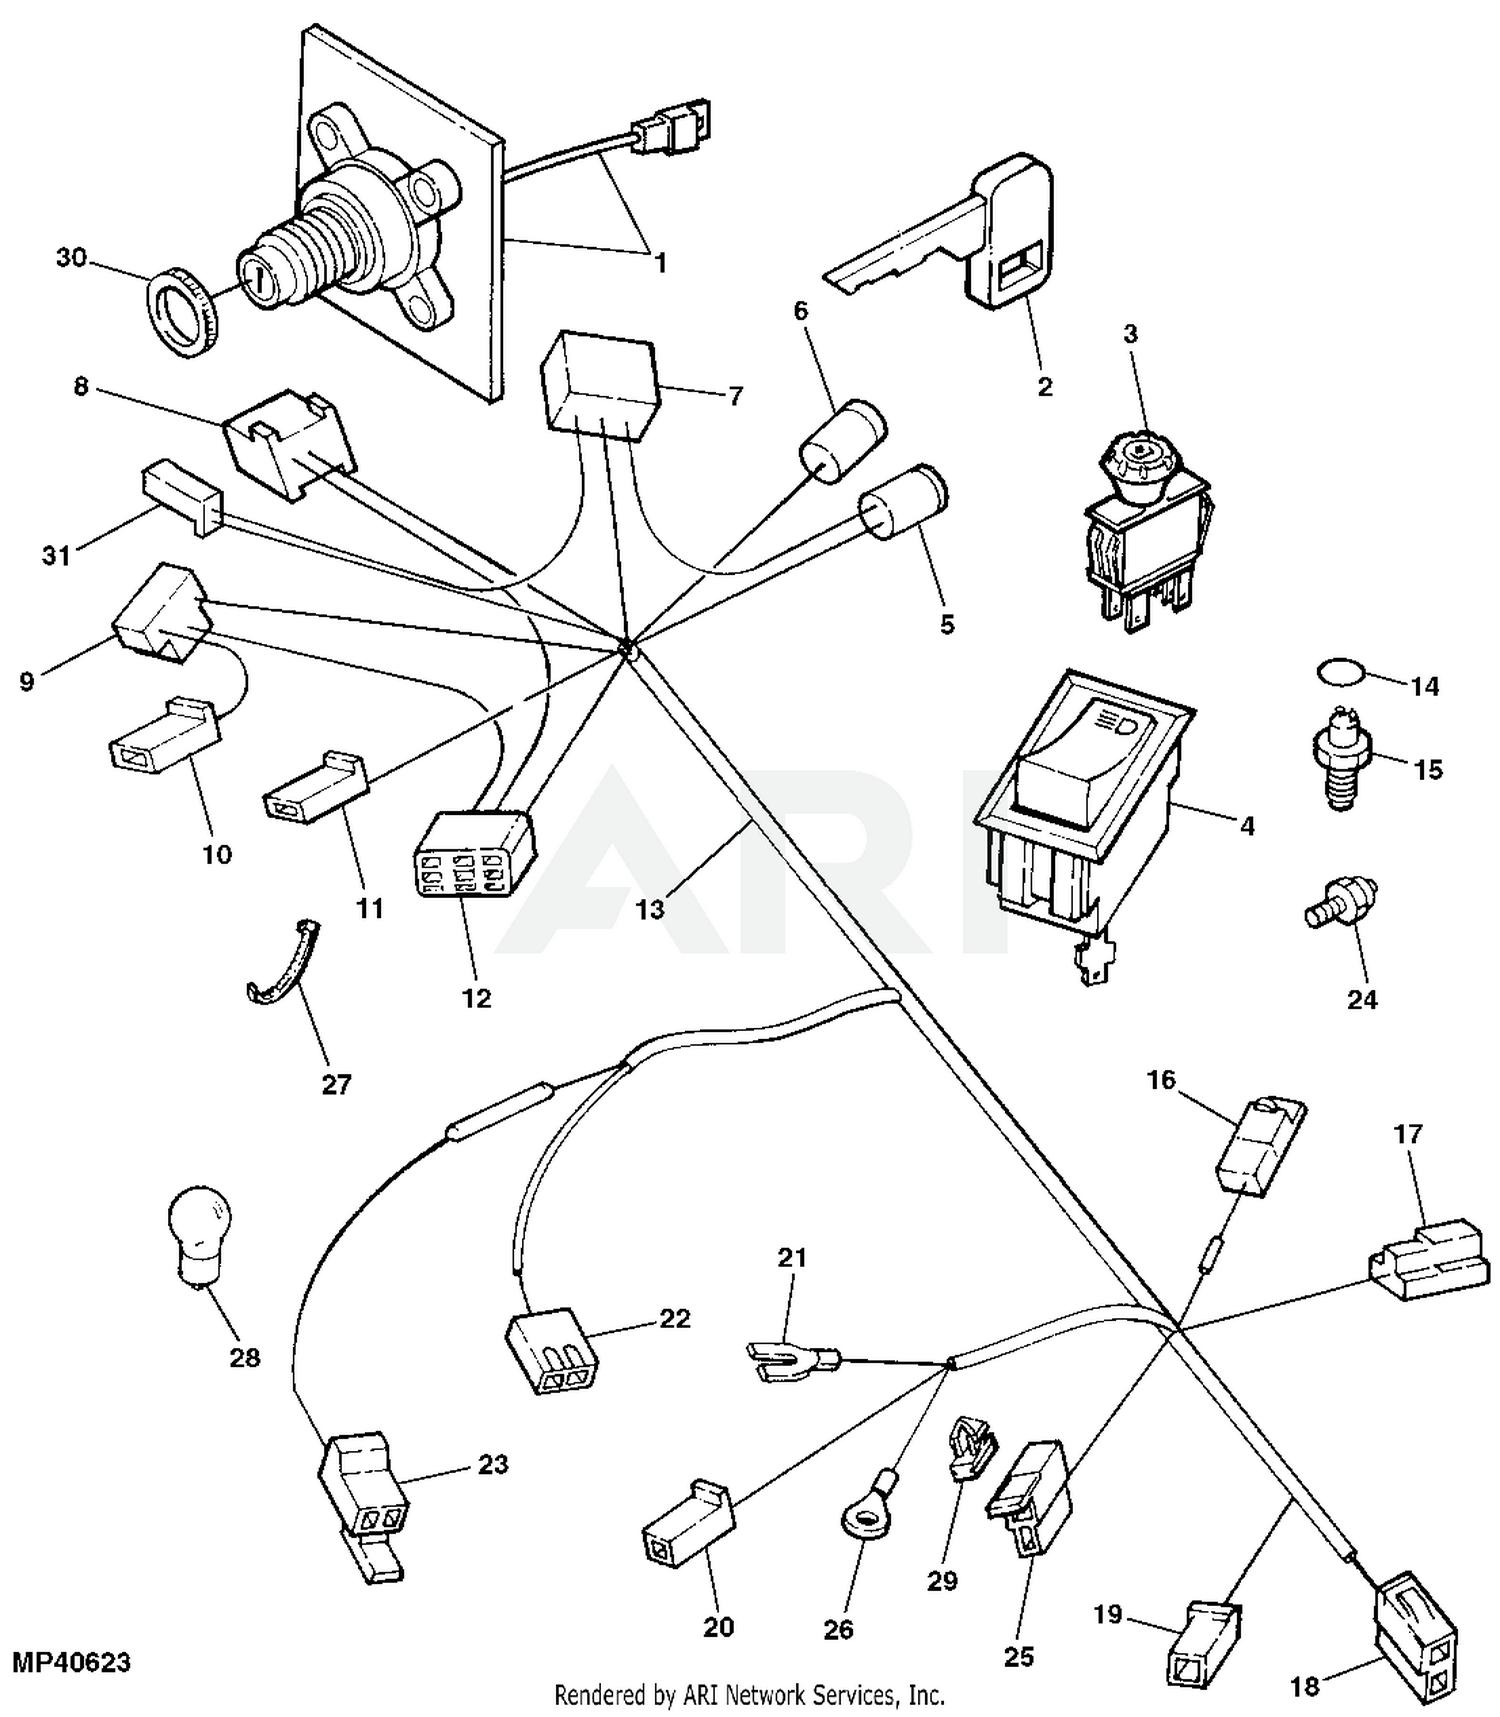 John Deere GT242 Garden Tractor (Gear) Without Mower Deck -PC2342 1993  Model M0G242B025001-035000 GT242 Garden Tractor (Gear) Without Mower Deck  -PC2342 1994 Model M0G242B035001-045000 GT242 Garden Tractor (Gear) Without  Mower Deck -PC2342 | Gt242 Wiring Diagram |  | Weingartz